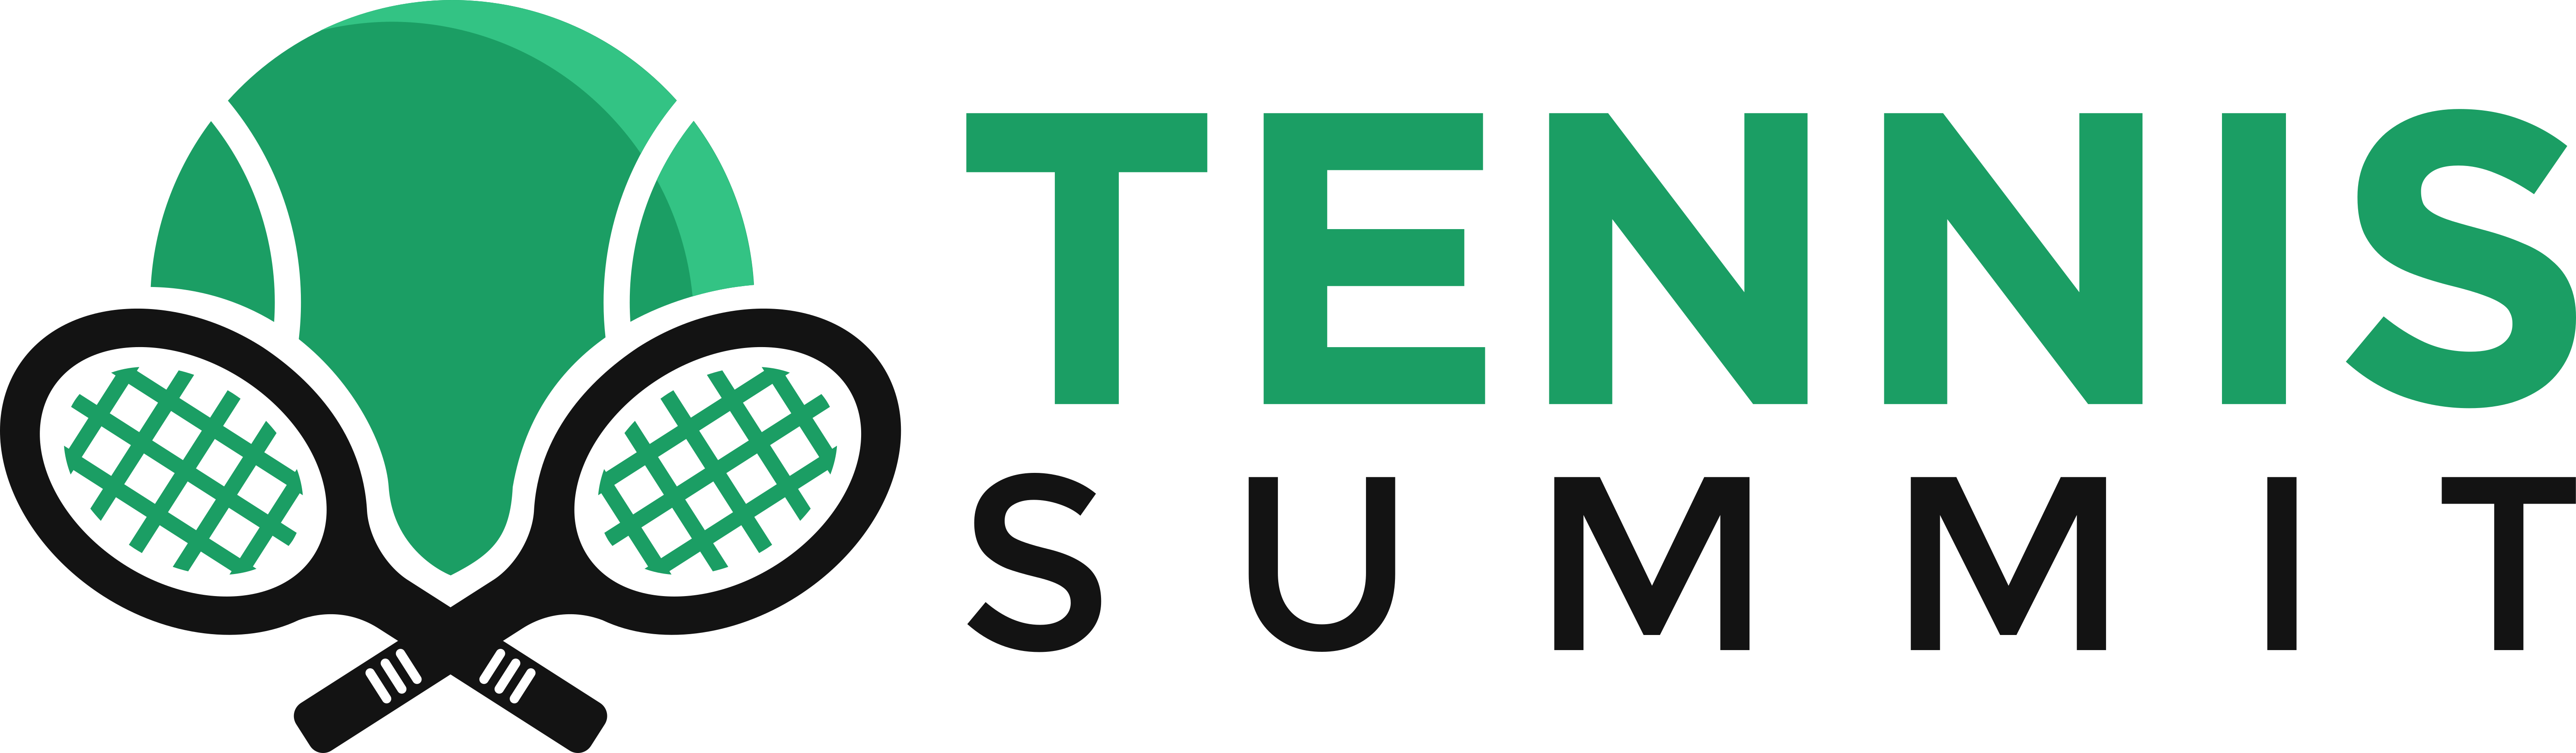 Tennis Summit 2018 logo